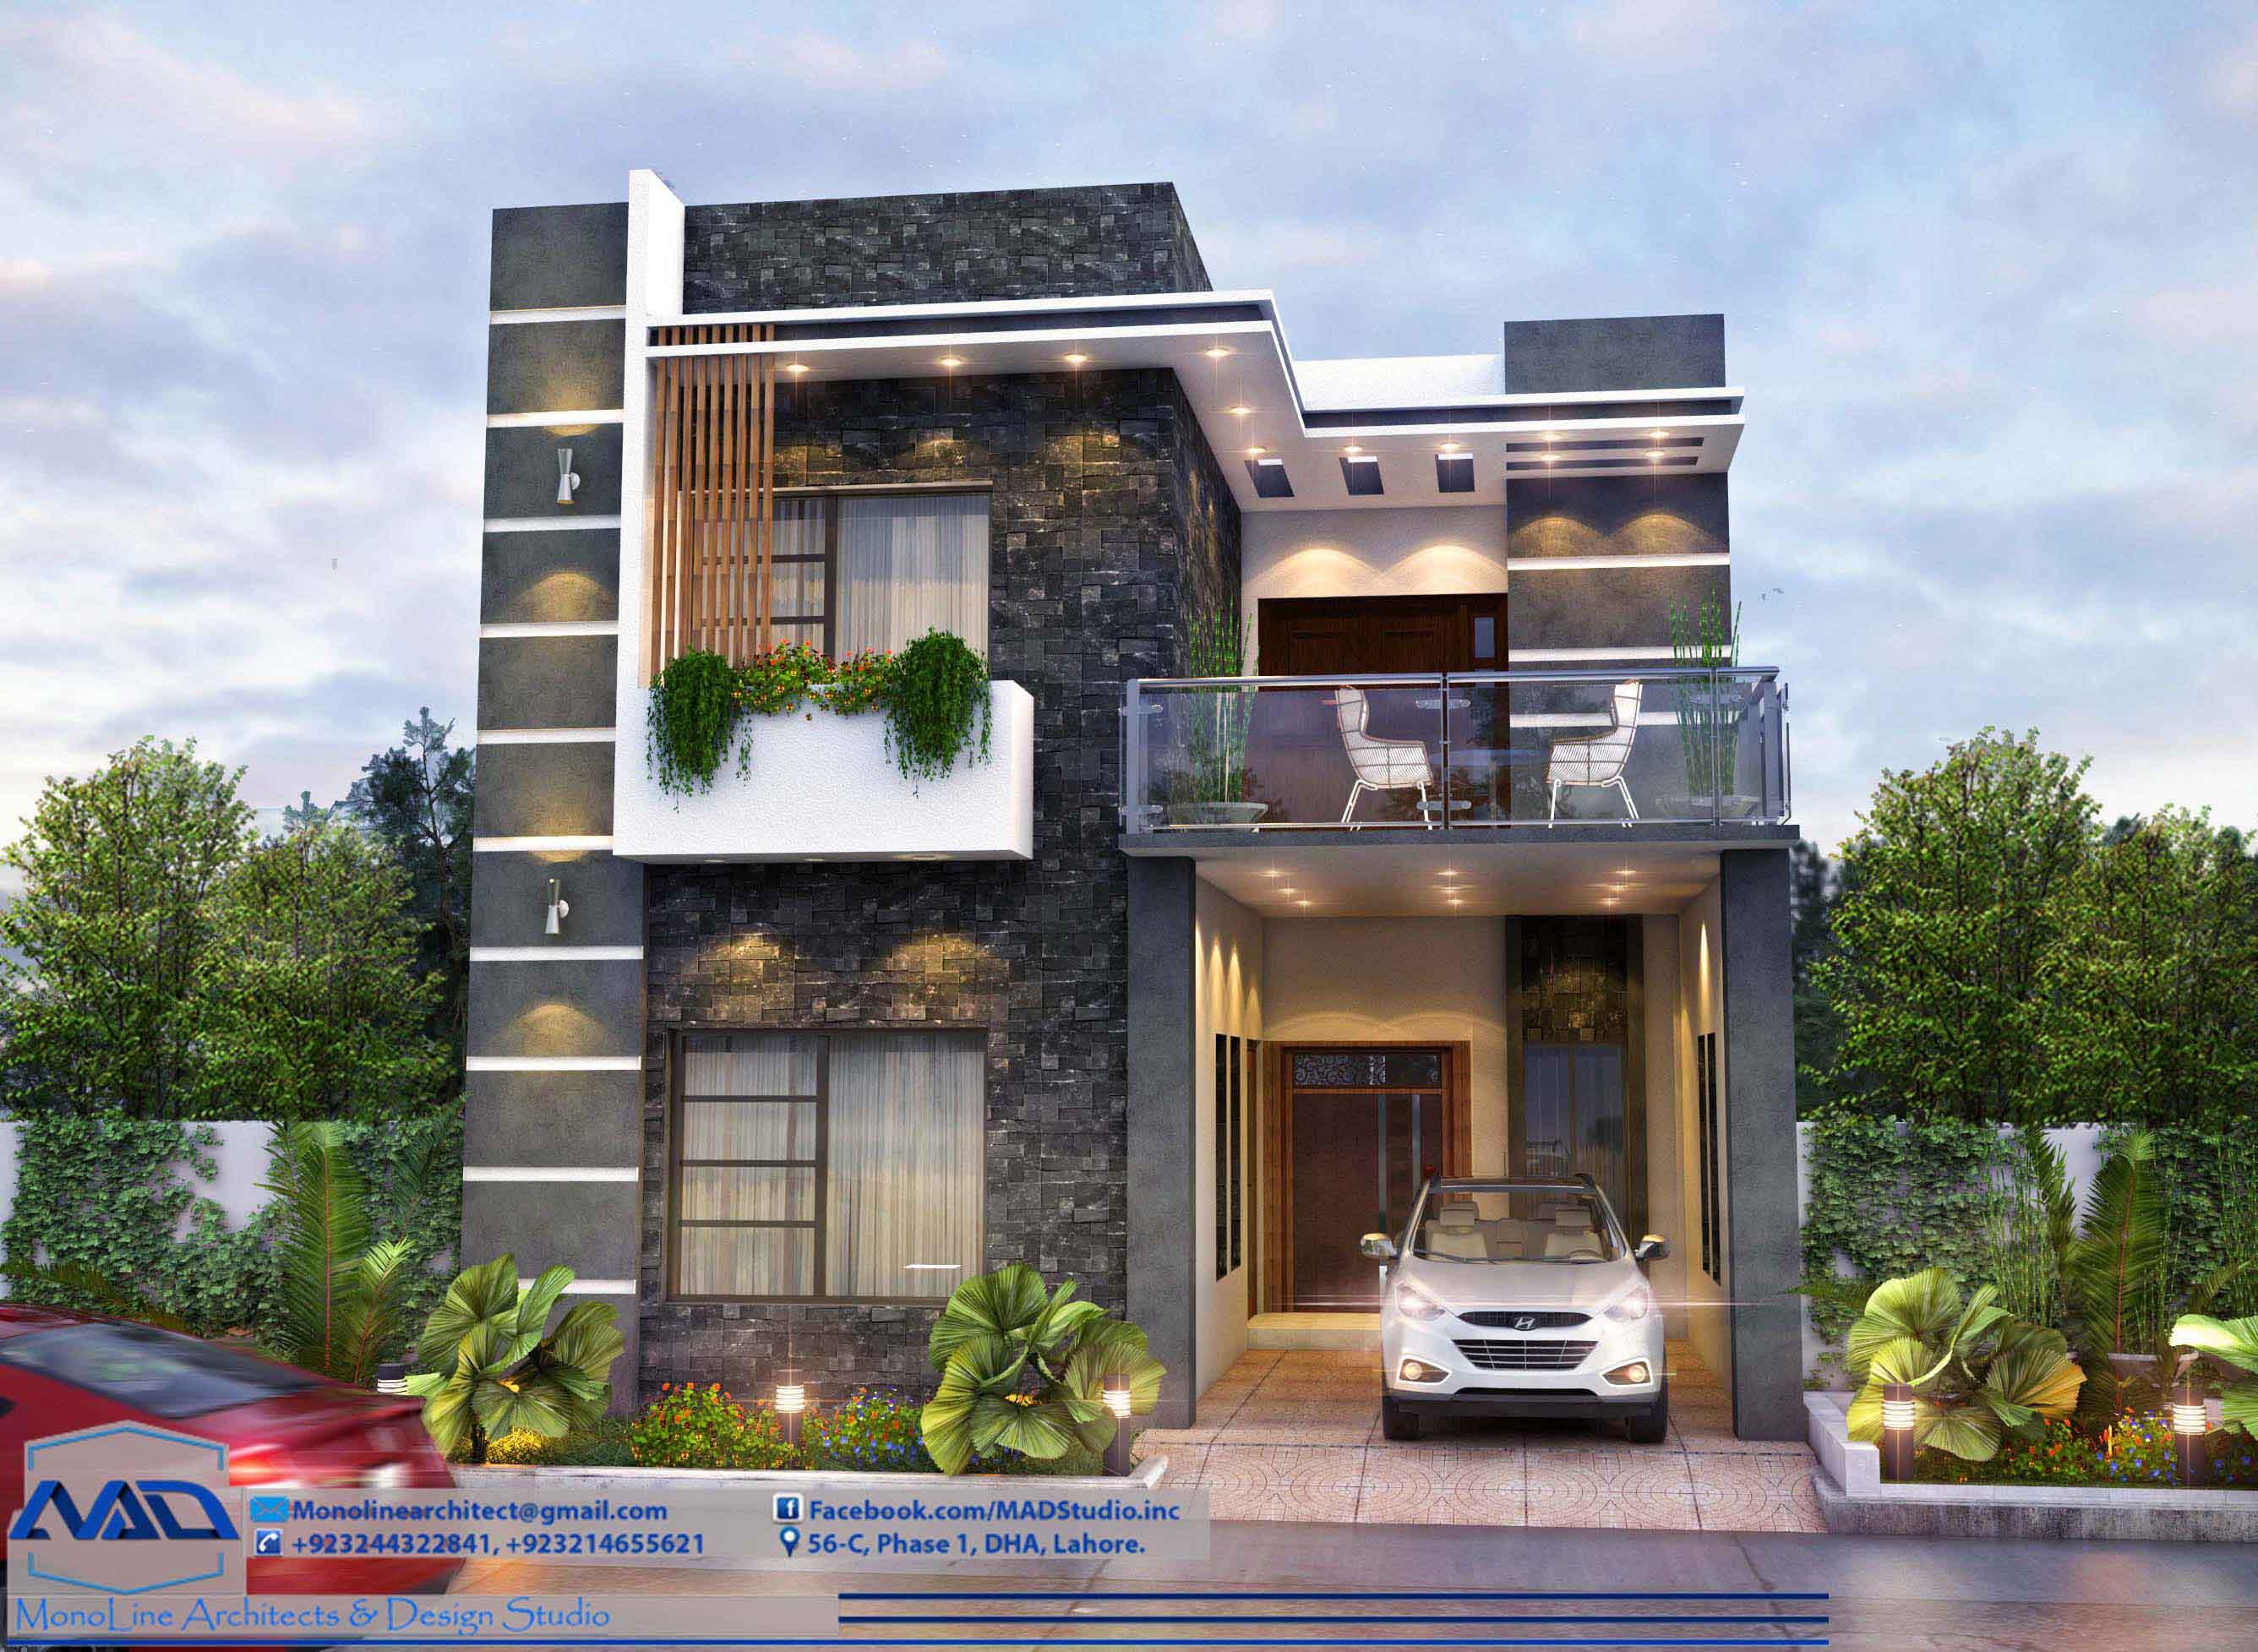 mehria house 1